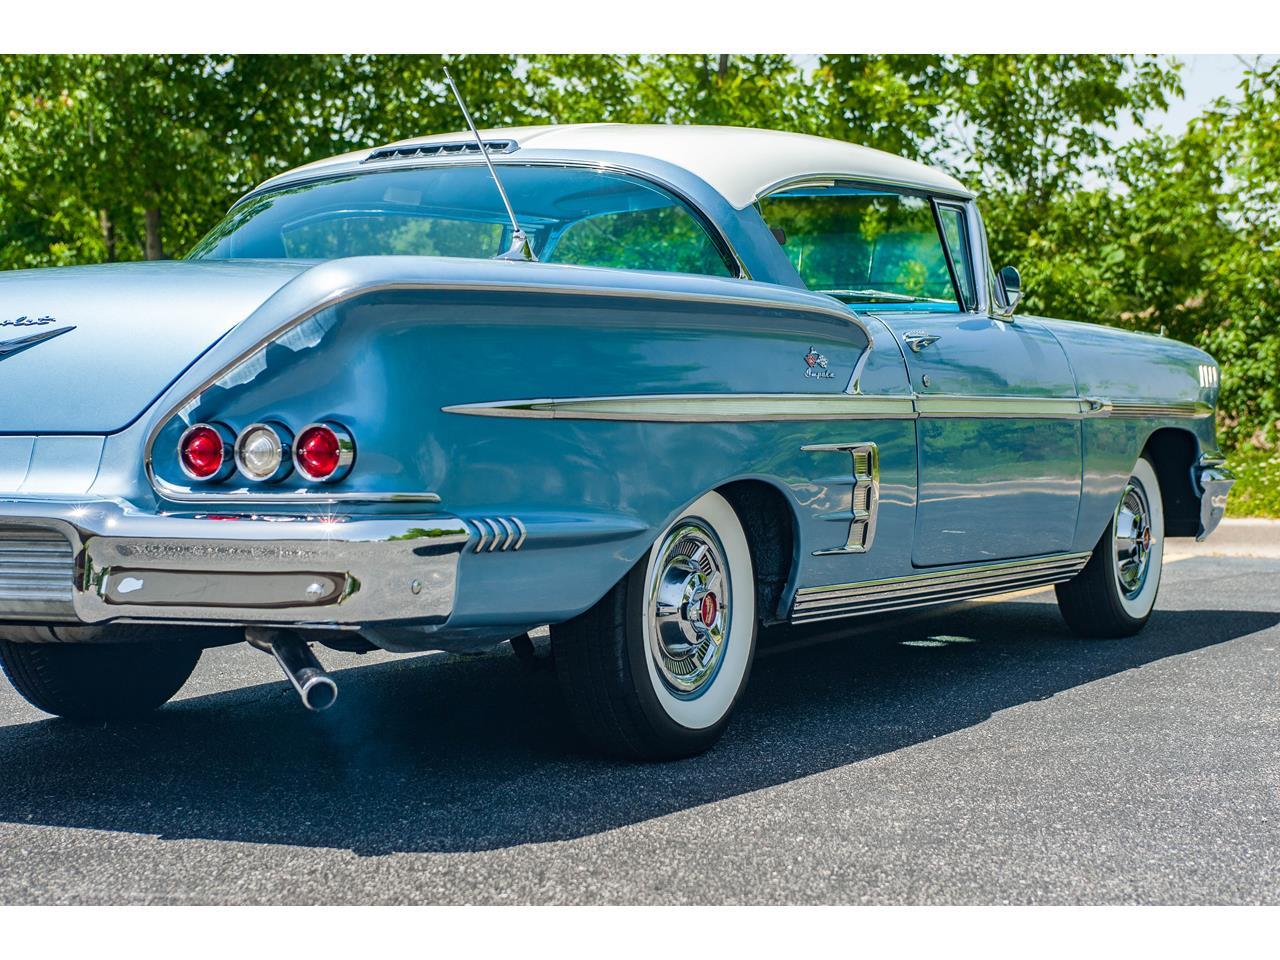 Large Picture of Classic '58 Chevrolet Impala located in O'Fallon Illinois - QB9Q